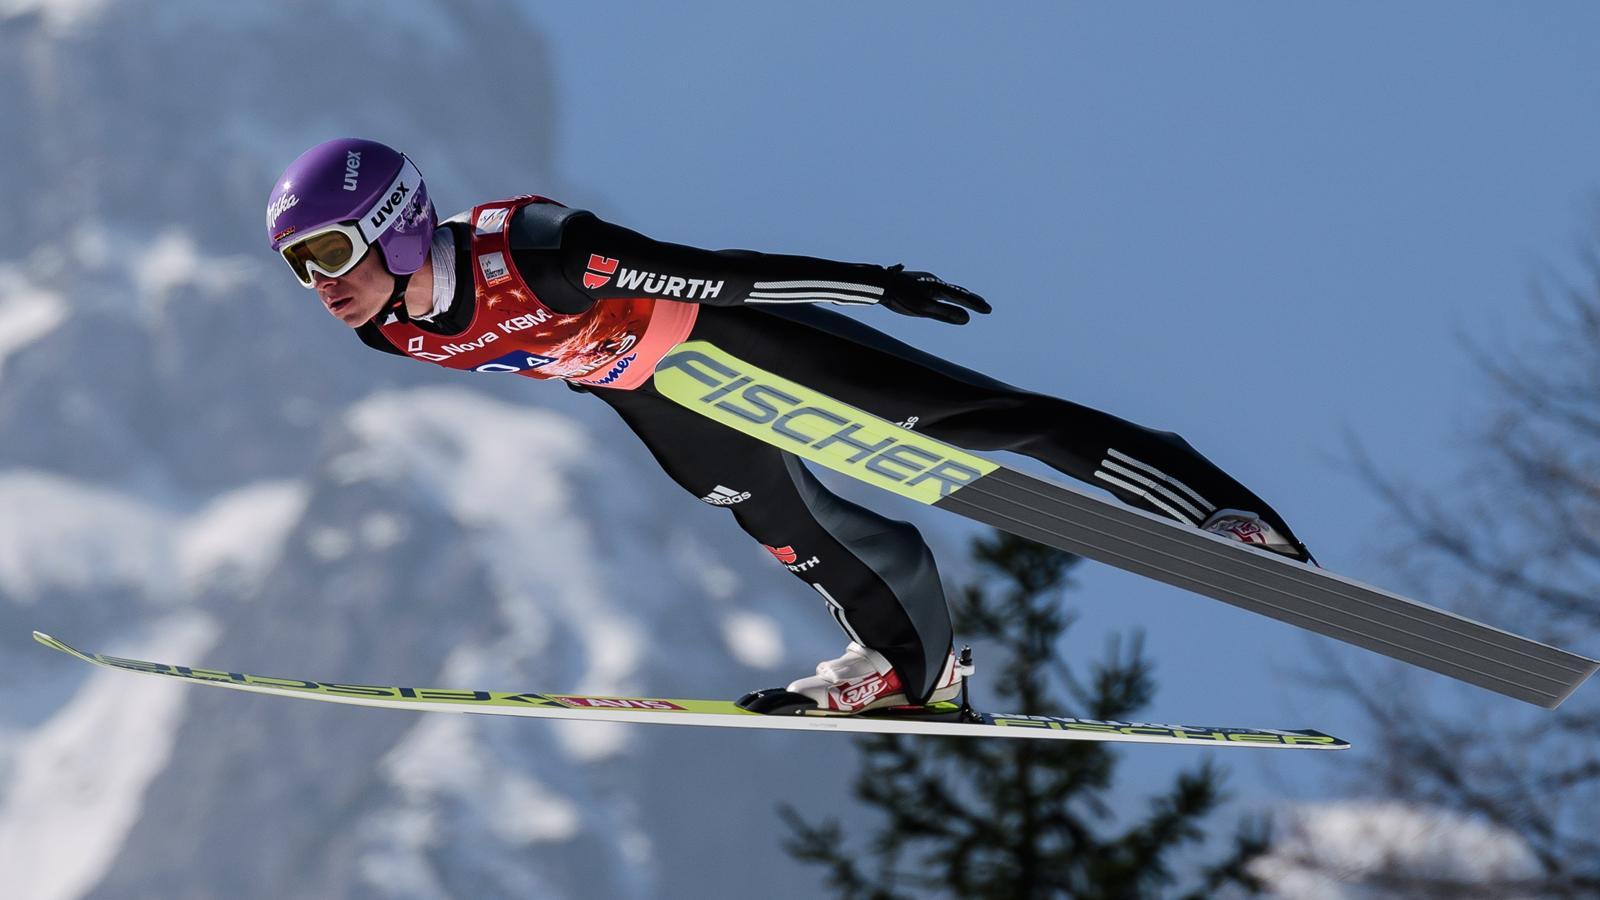 VIDEO - Skiflug-Weltcup Planica: Andreas Wellinger, Noriaki Kasai und Stefan Kraft verzaubern ...